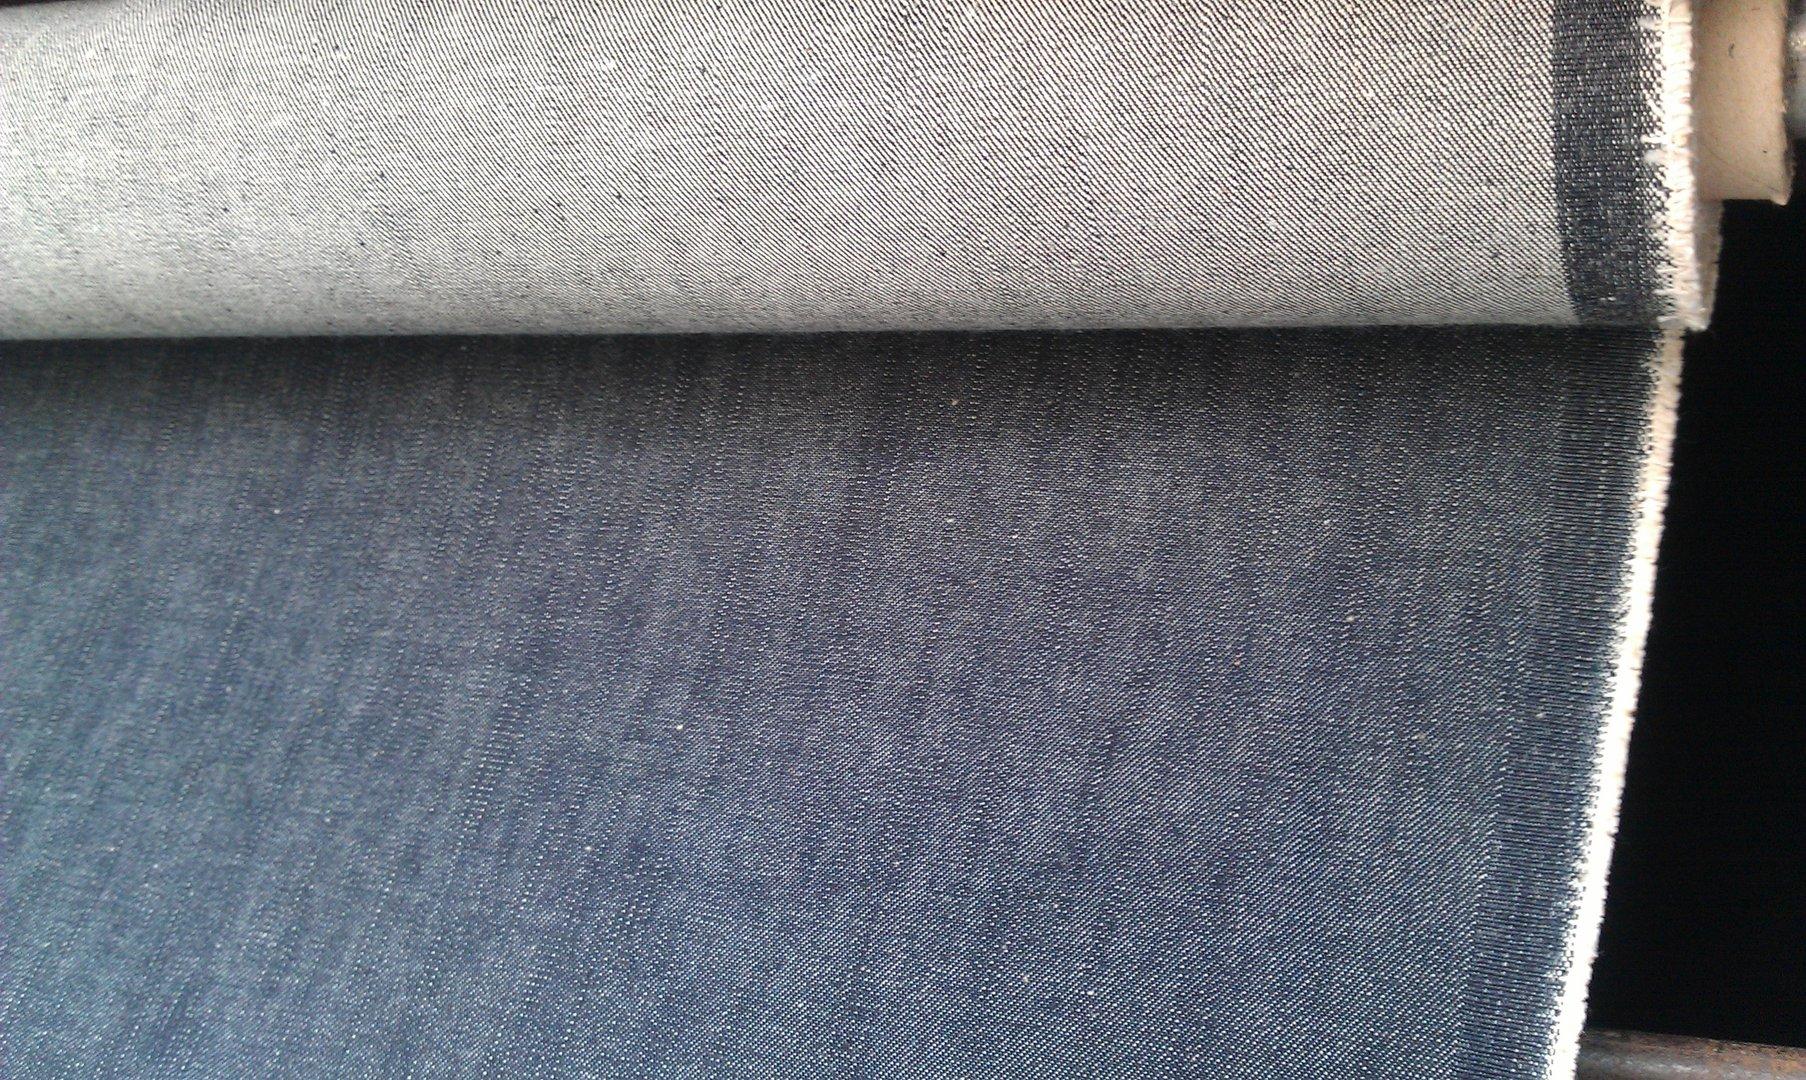 Jeans stretch fabric denim blu by meters width cm 150 fabrics